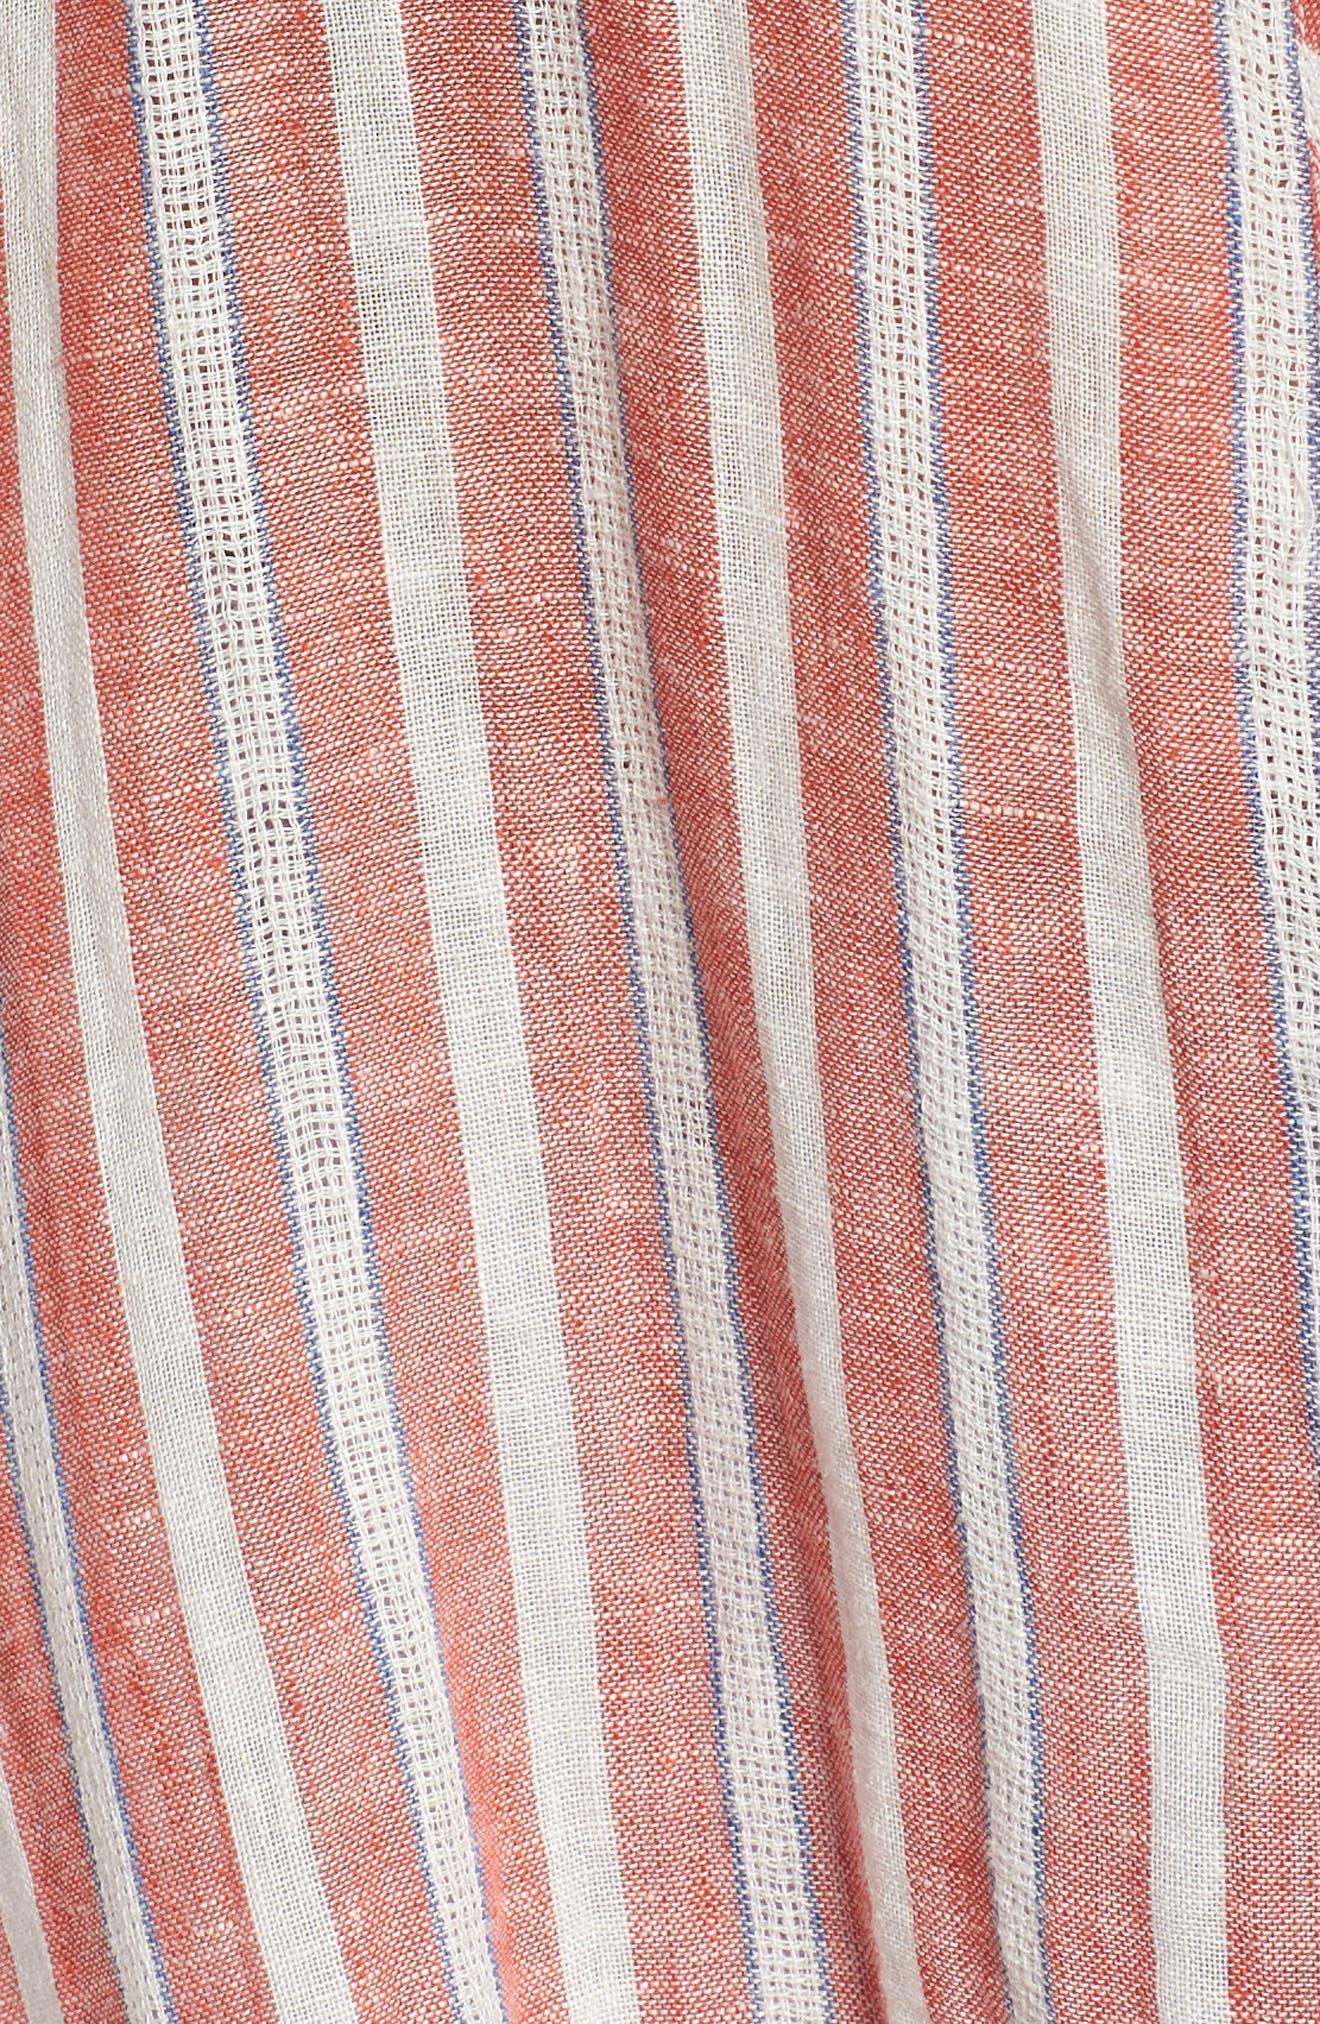 Tie Back Stripe Shirt,                             Alternate thumbnail 6, color,                             610